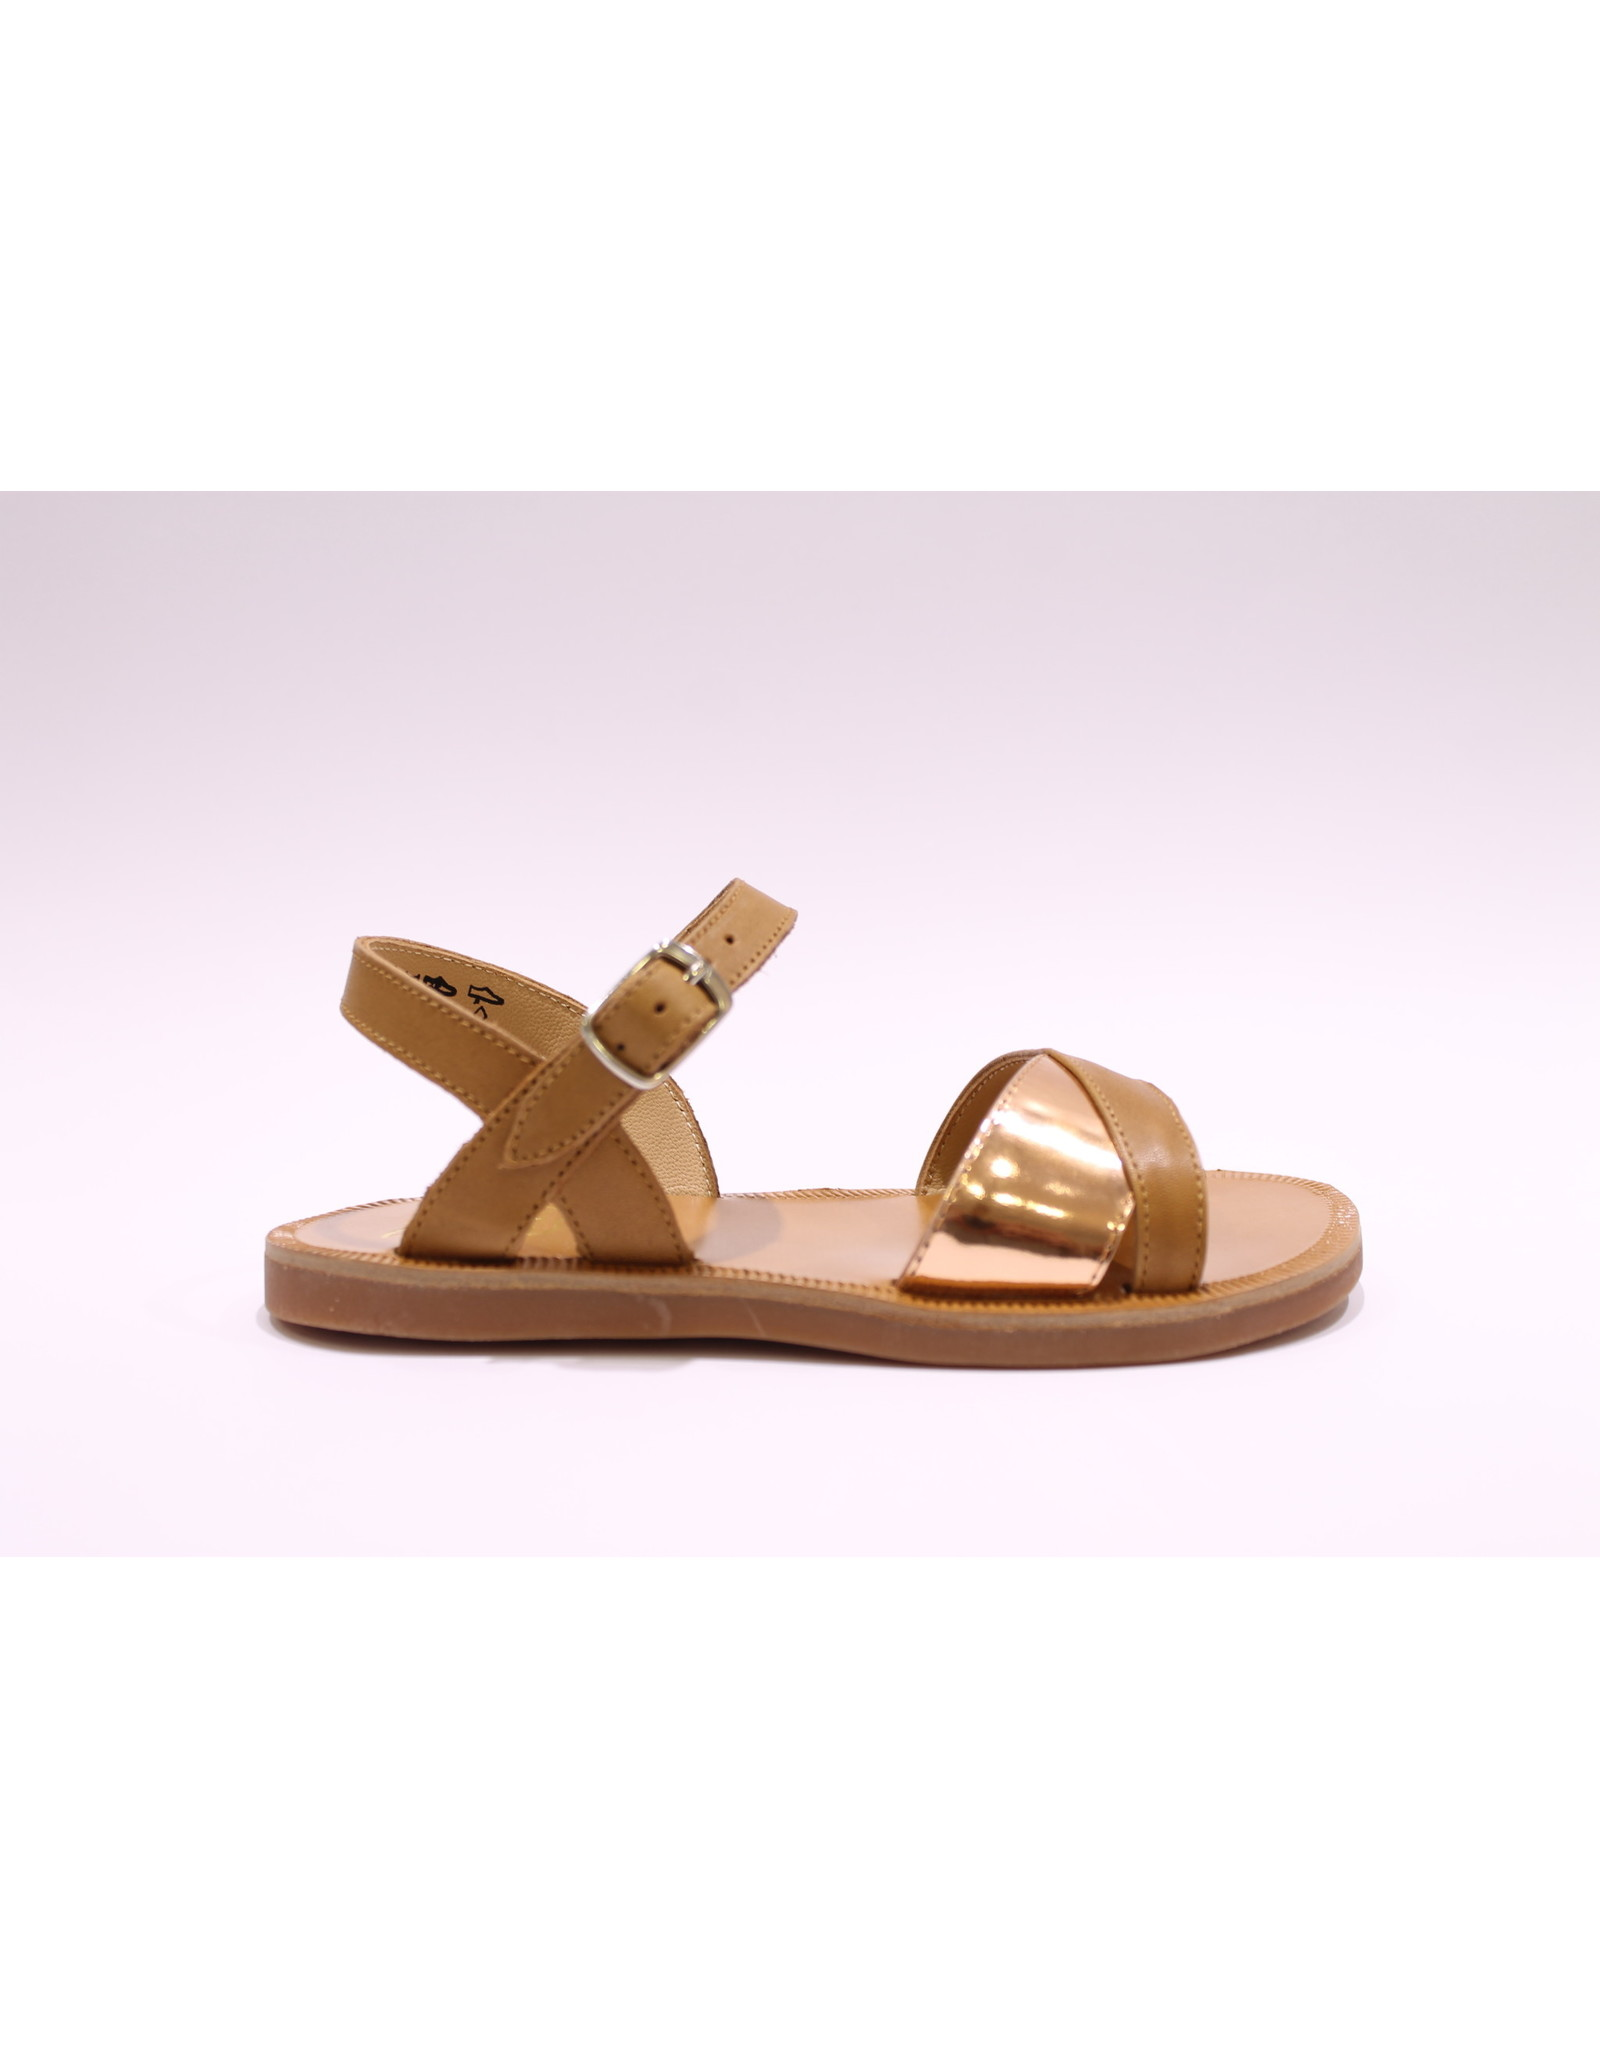 Pom d'Api Sandaal camel/bronze